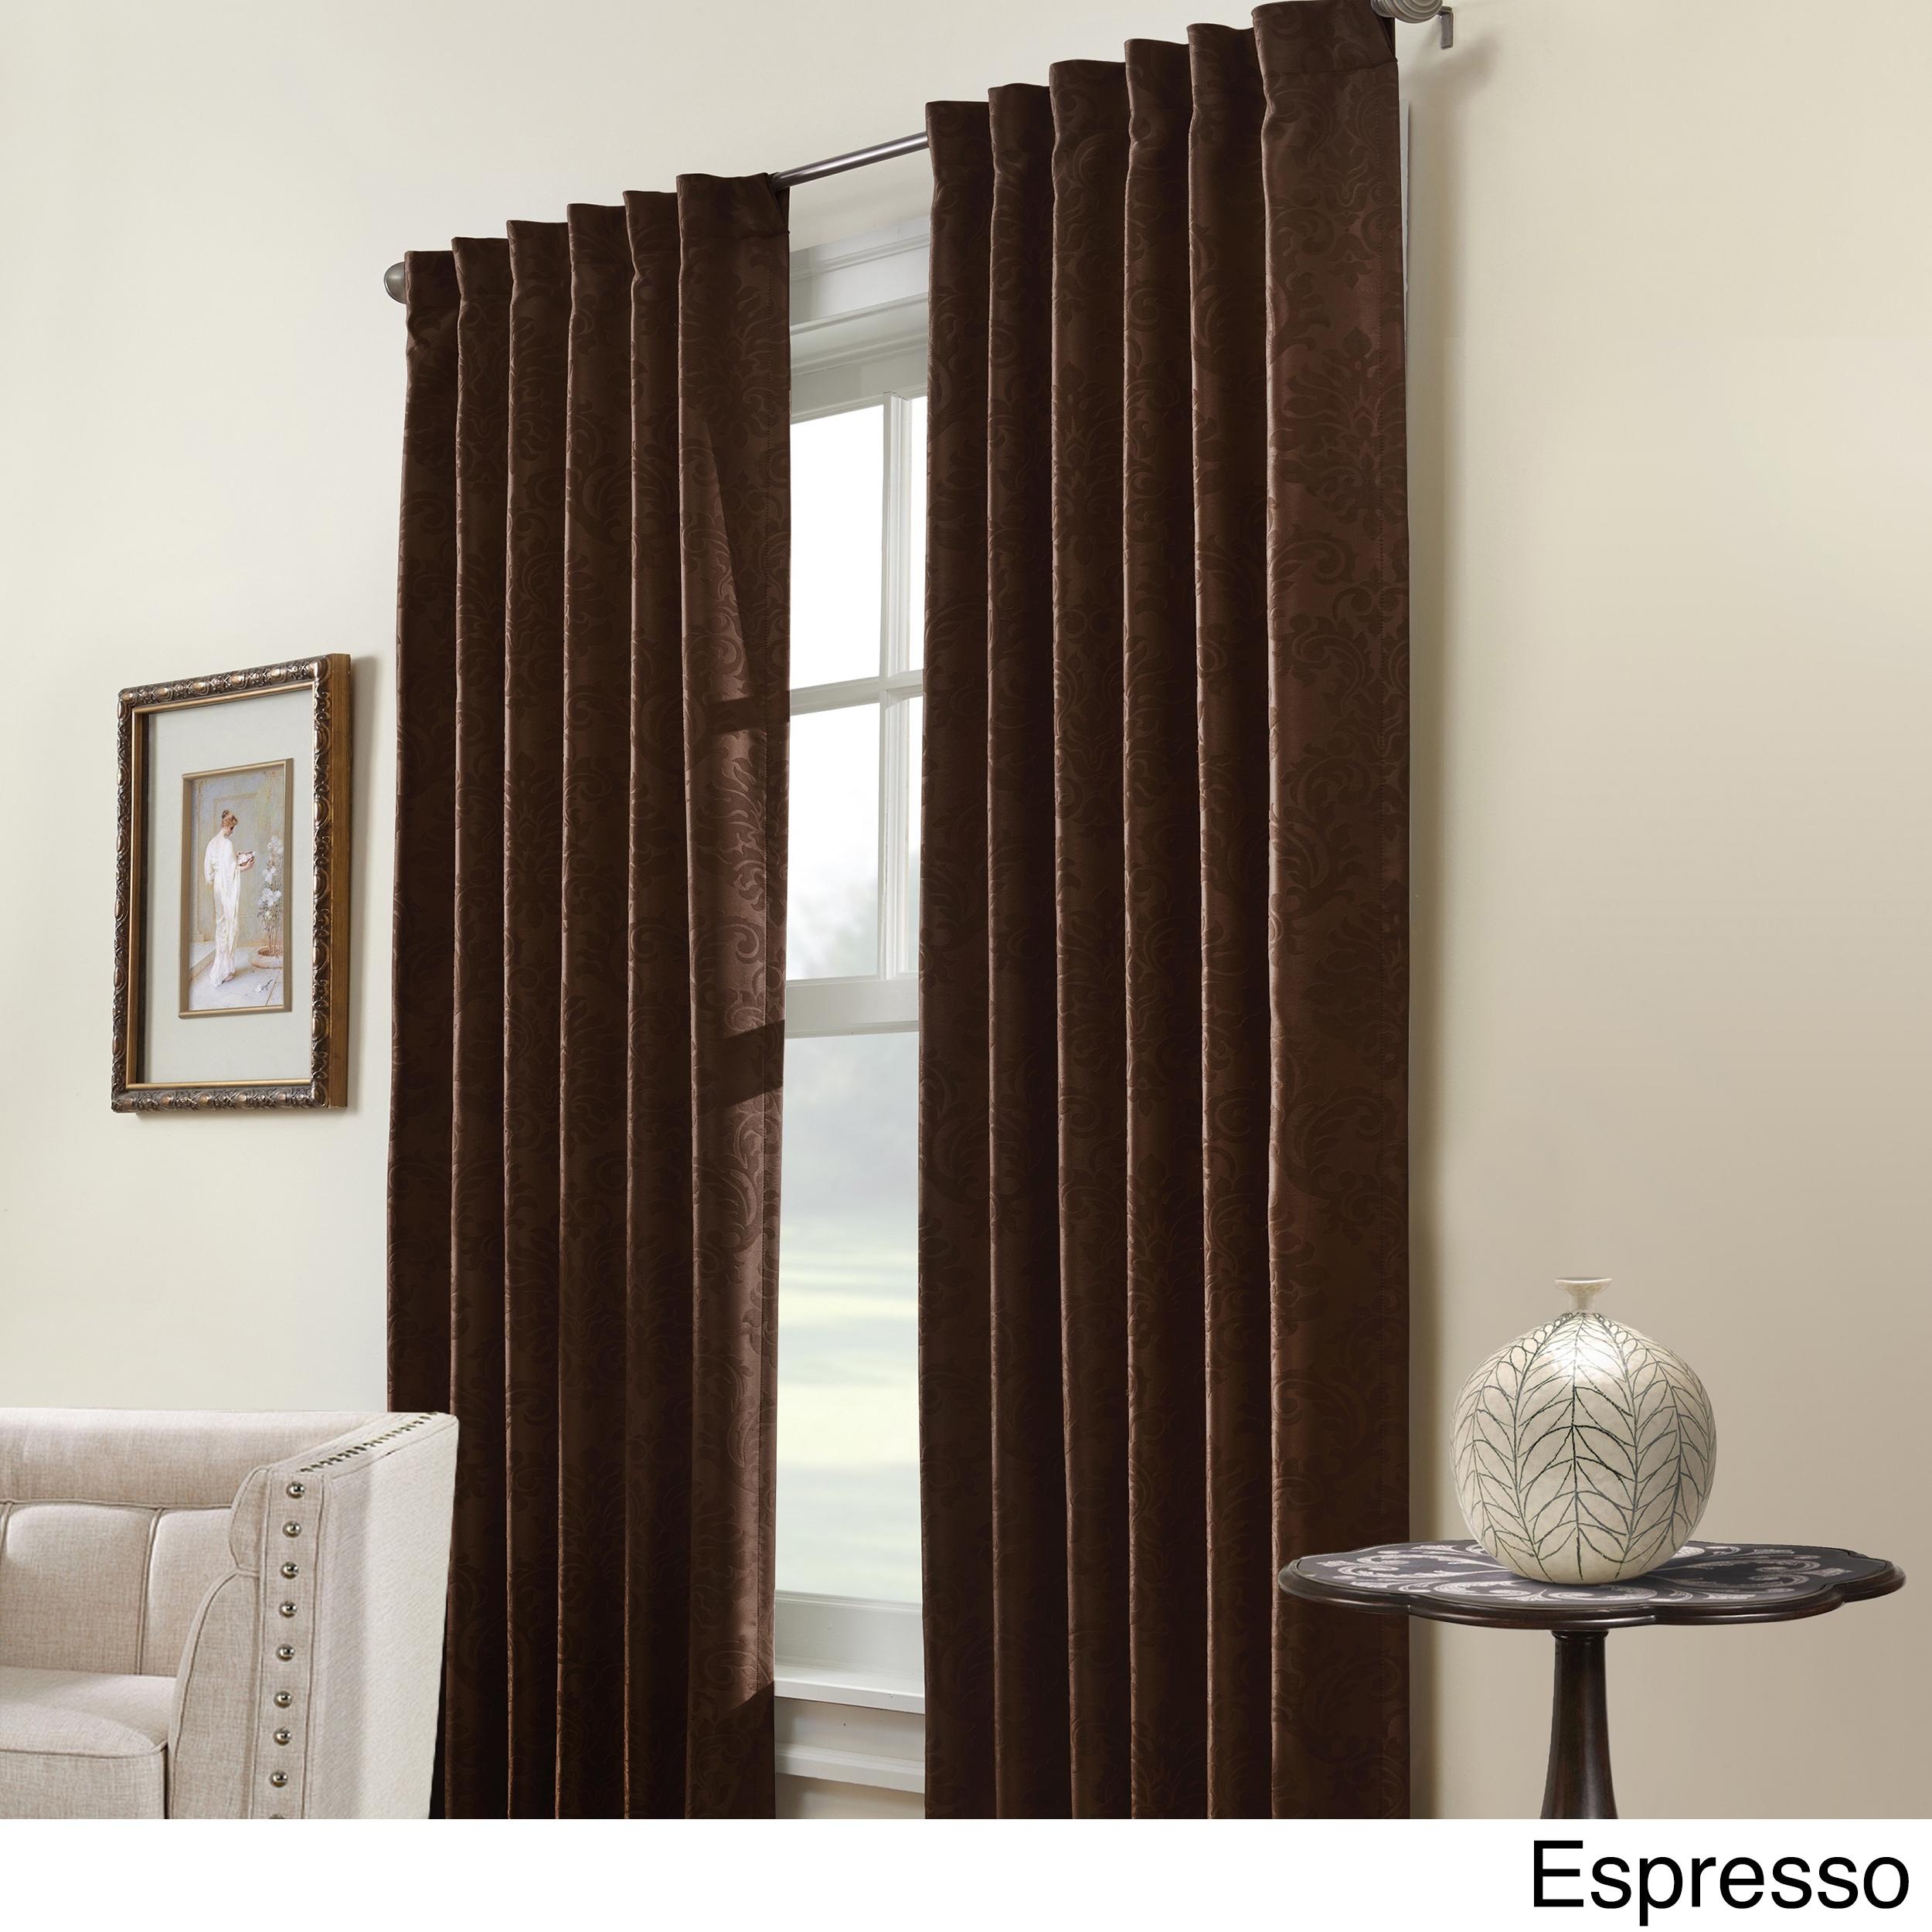 Belgique Insulated Curtain Panel (Espresso 95-Inch), Brow...